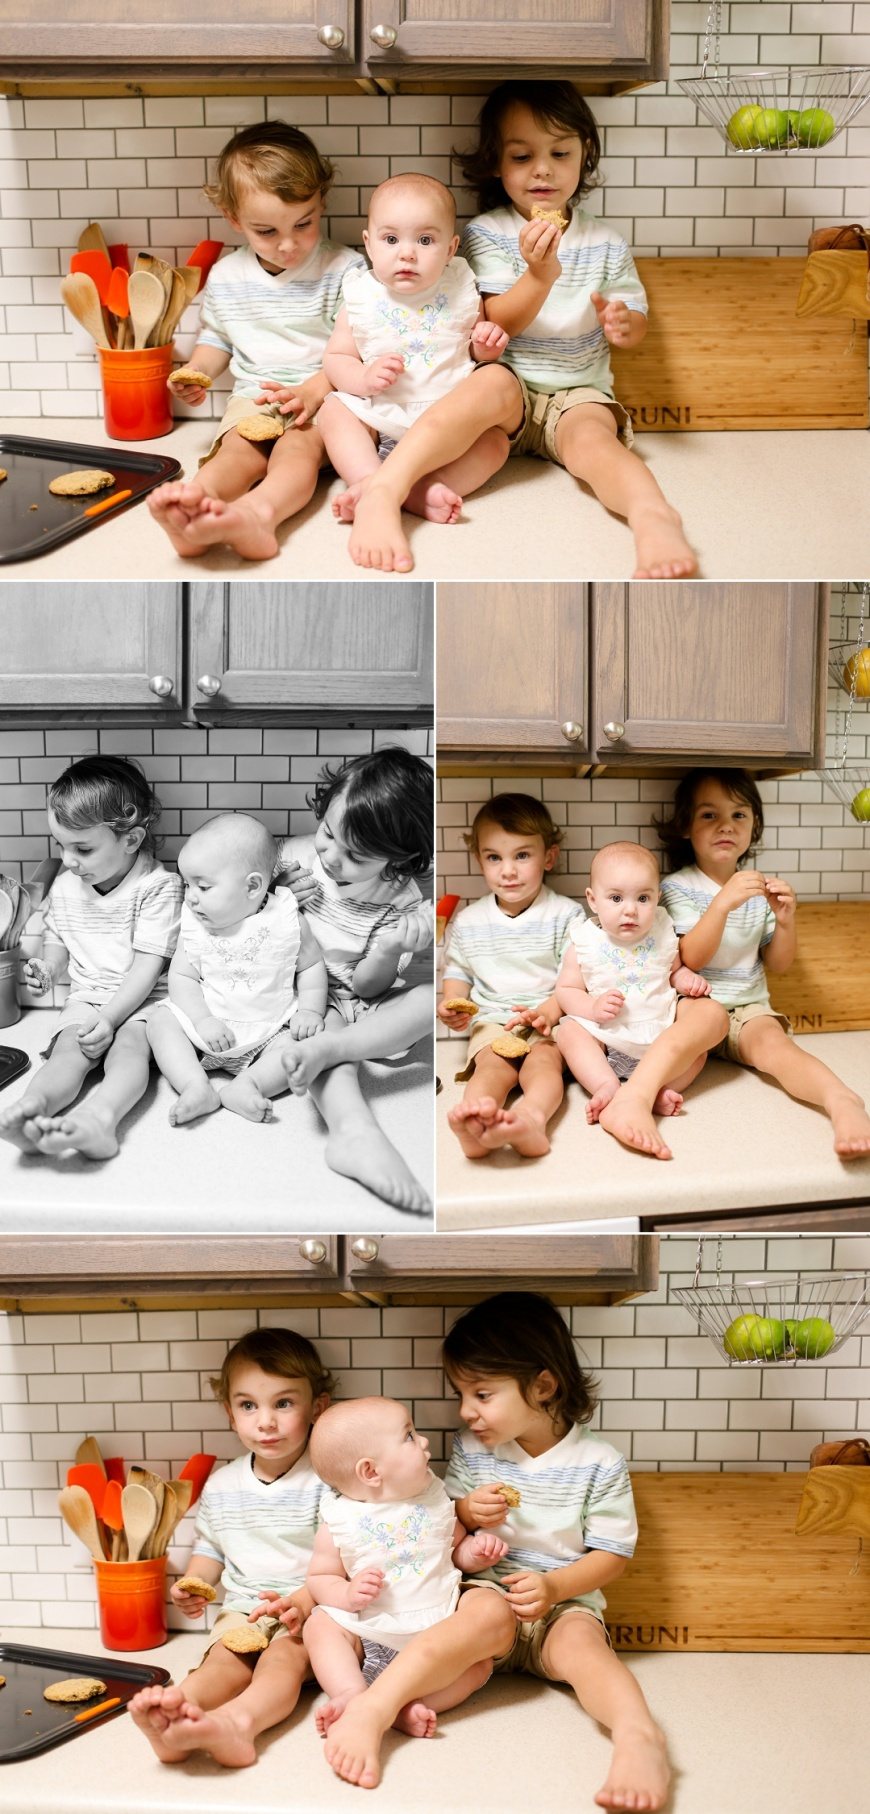 Pensacola-Family-Photographer-Bruni (107).jpg